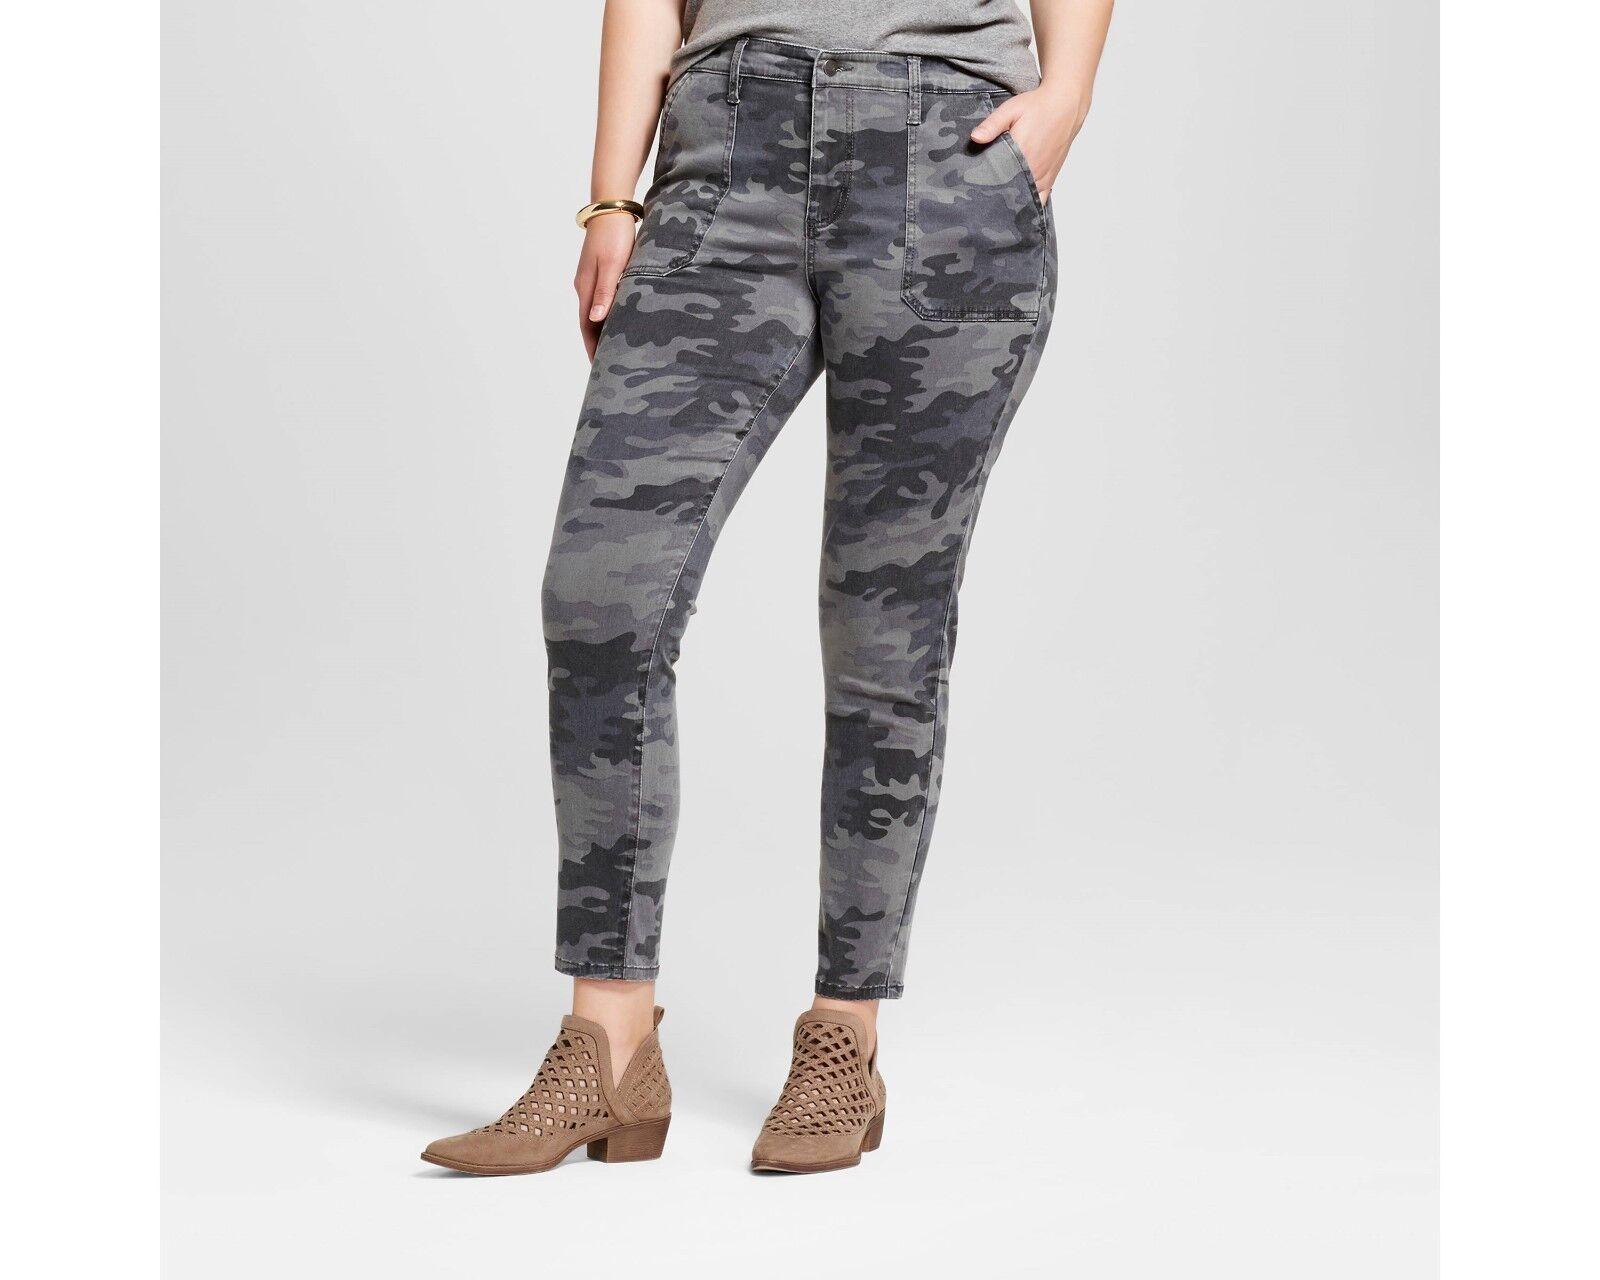 e9682c85ed043 Women's Plus Size Utility Jeggings - Ava & Viv™ Camo NWT 24W | eBay